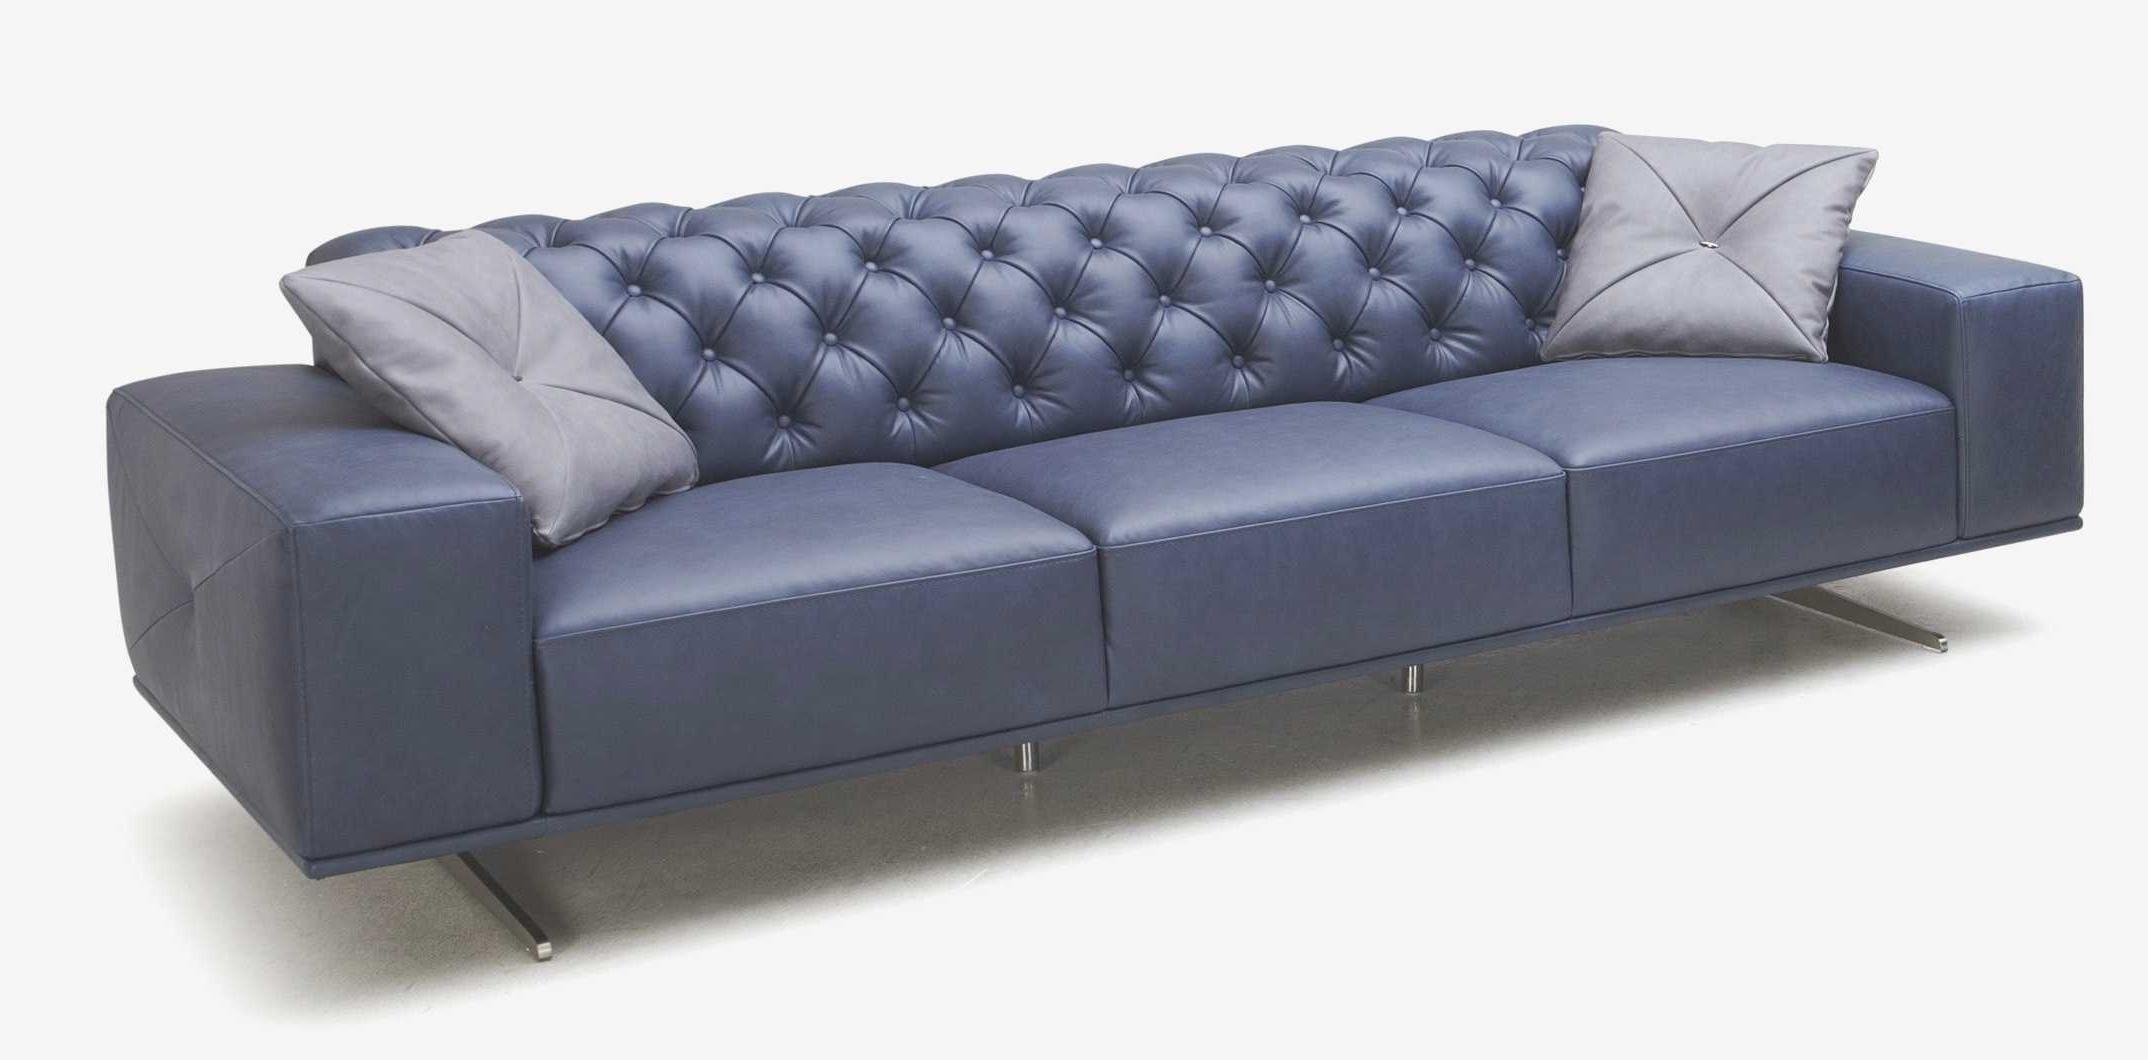 Sofas Baratos Granada Xtd6 Tiendas De sofas En Granada Nuevo sofà Julieta En Tu Tienda sofass